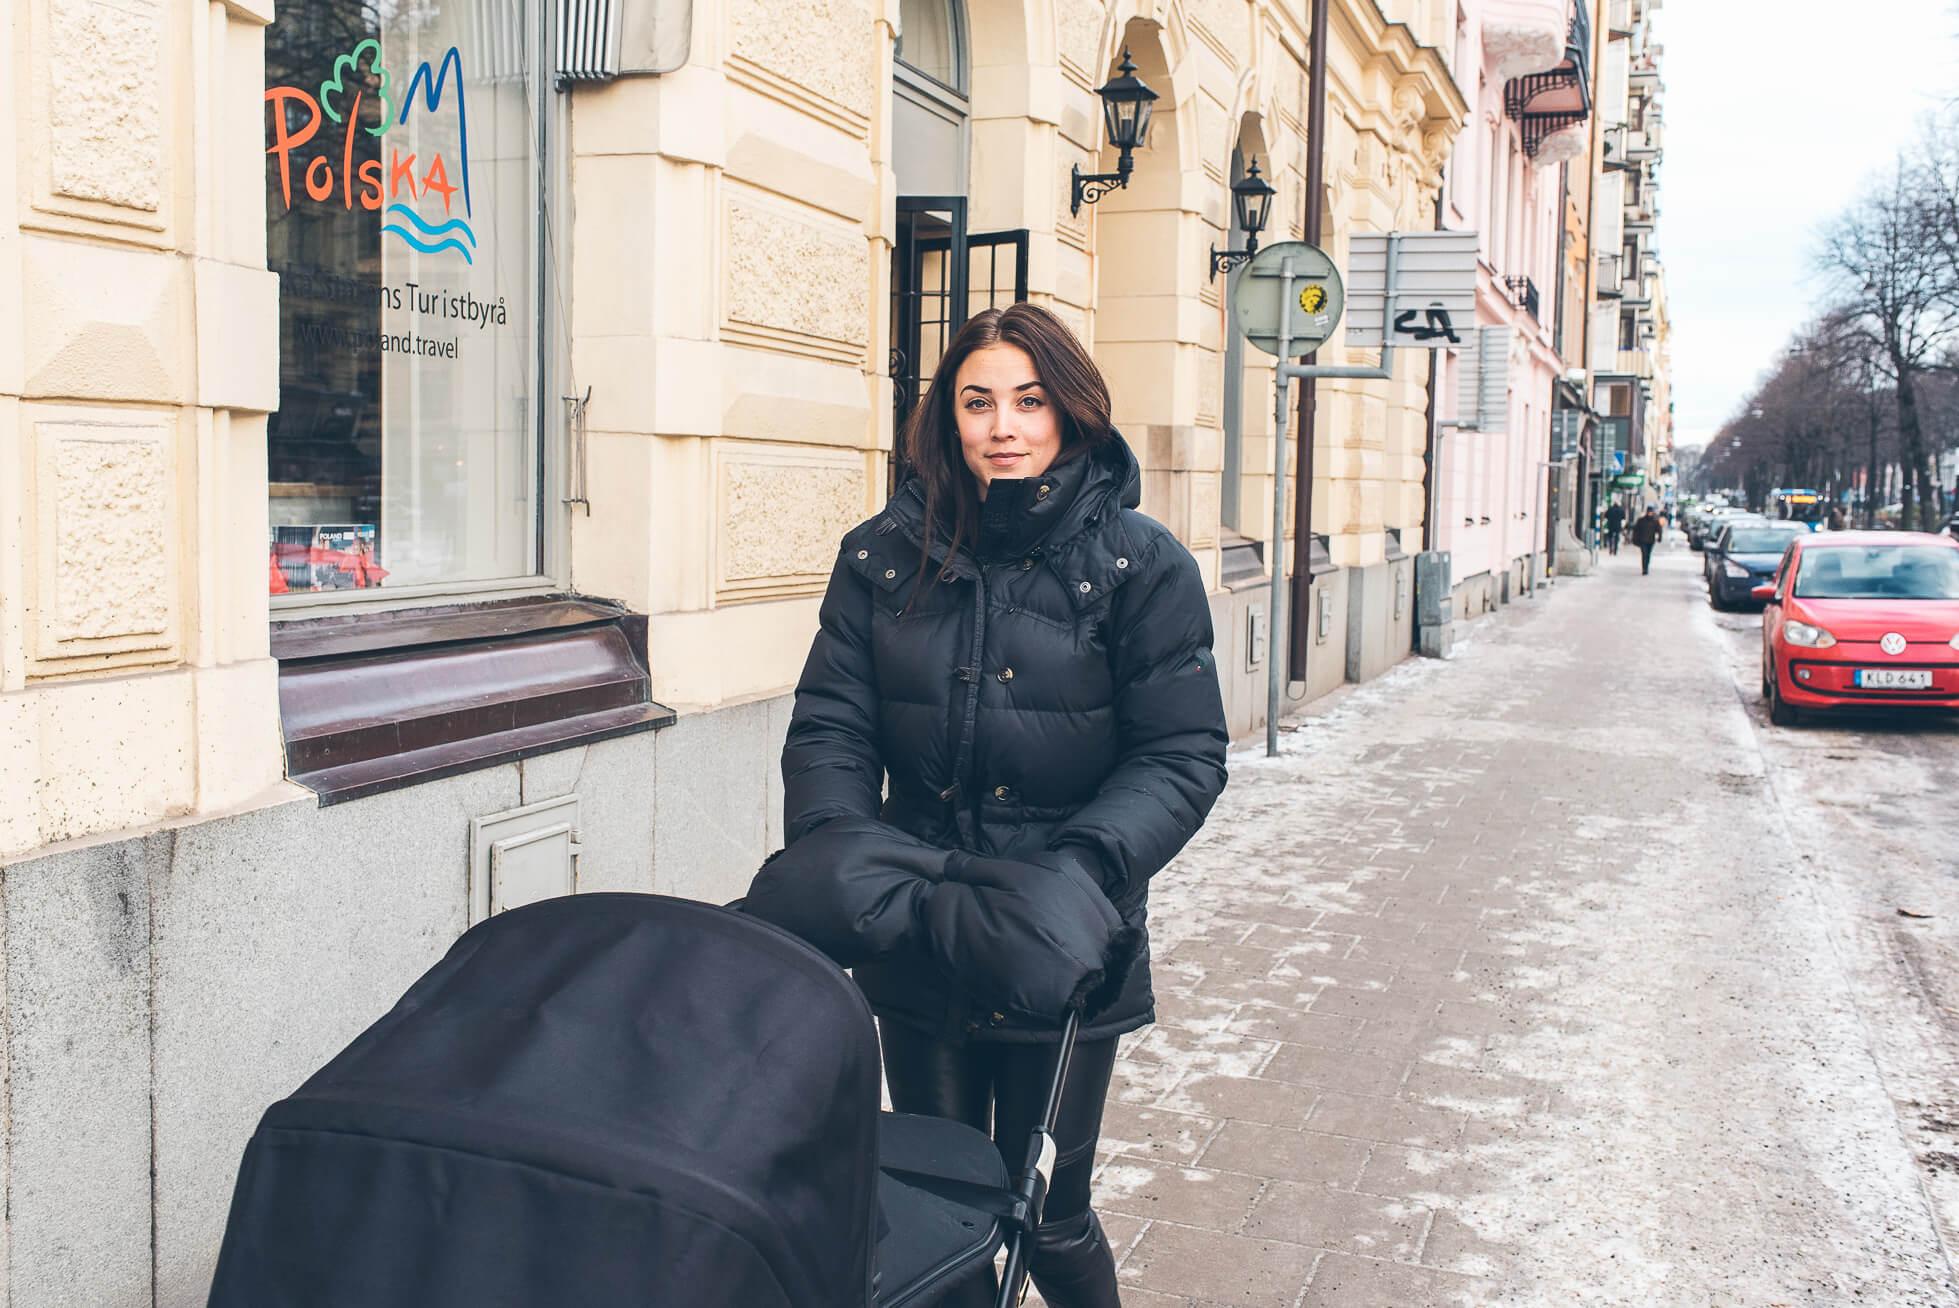 janni-deler-stockholm-snapshotsDSC_6666